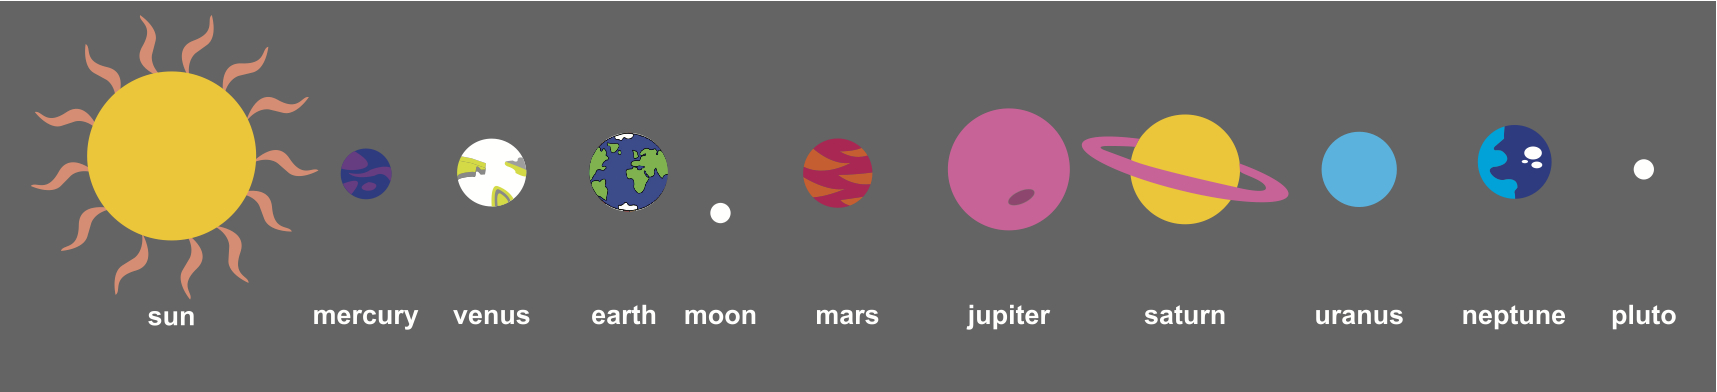 Playground Marking Solar System